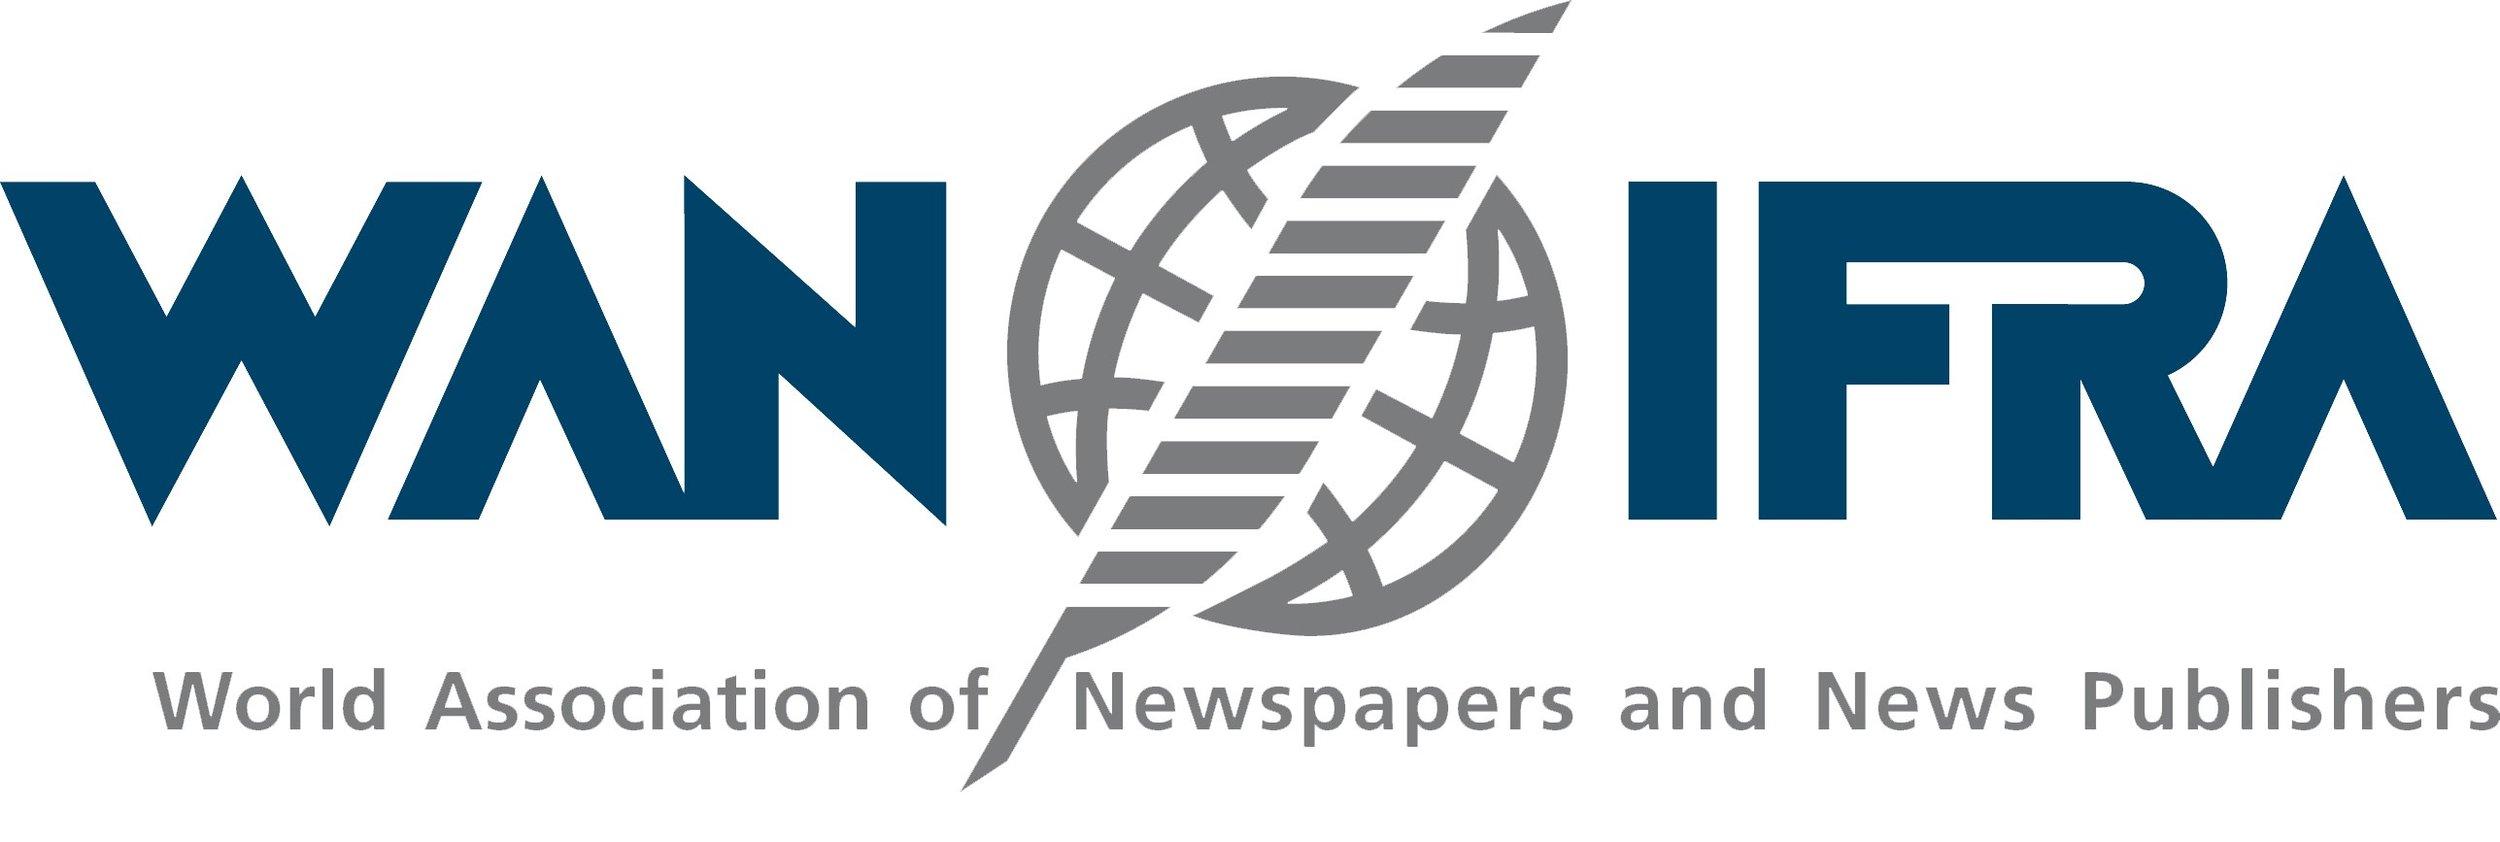 WAN-IFRA logo.jpg